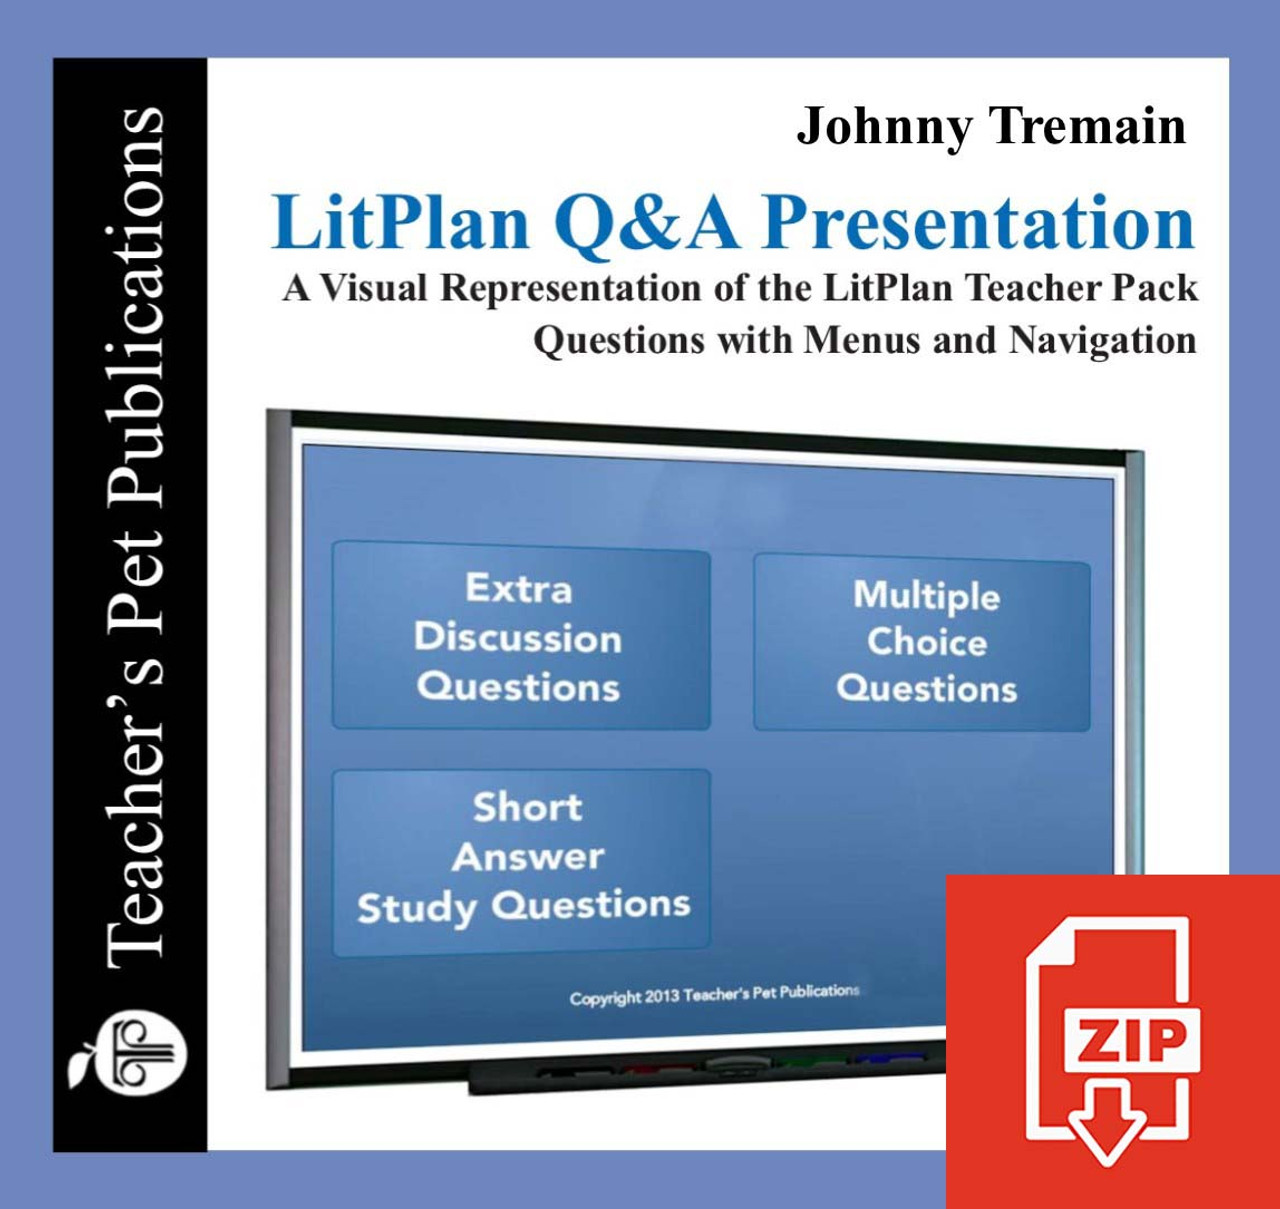 johnny tremain free pdf download